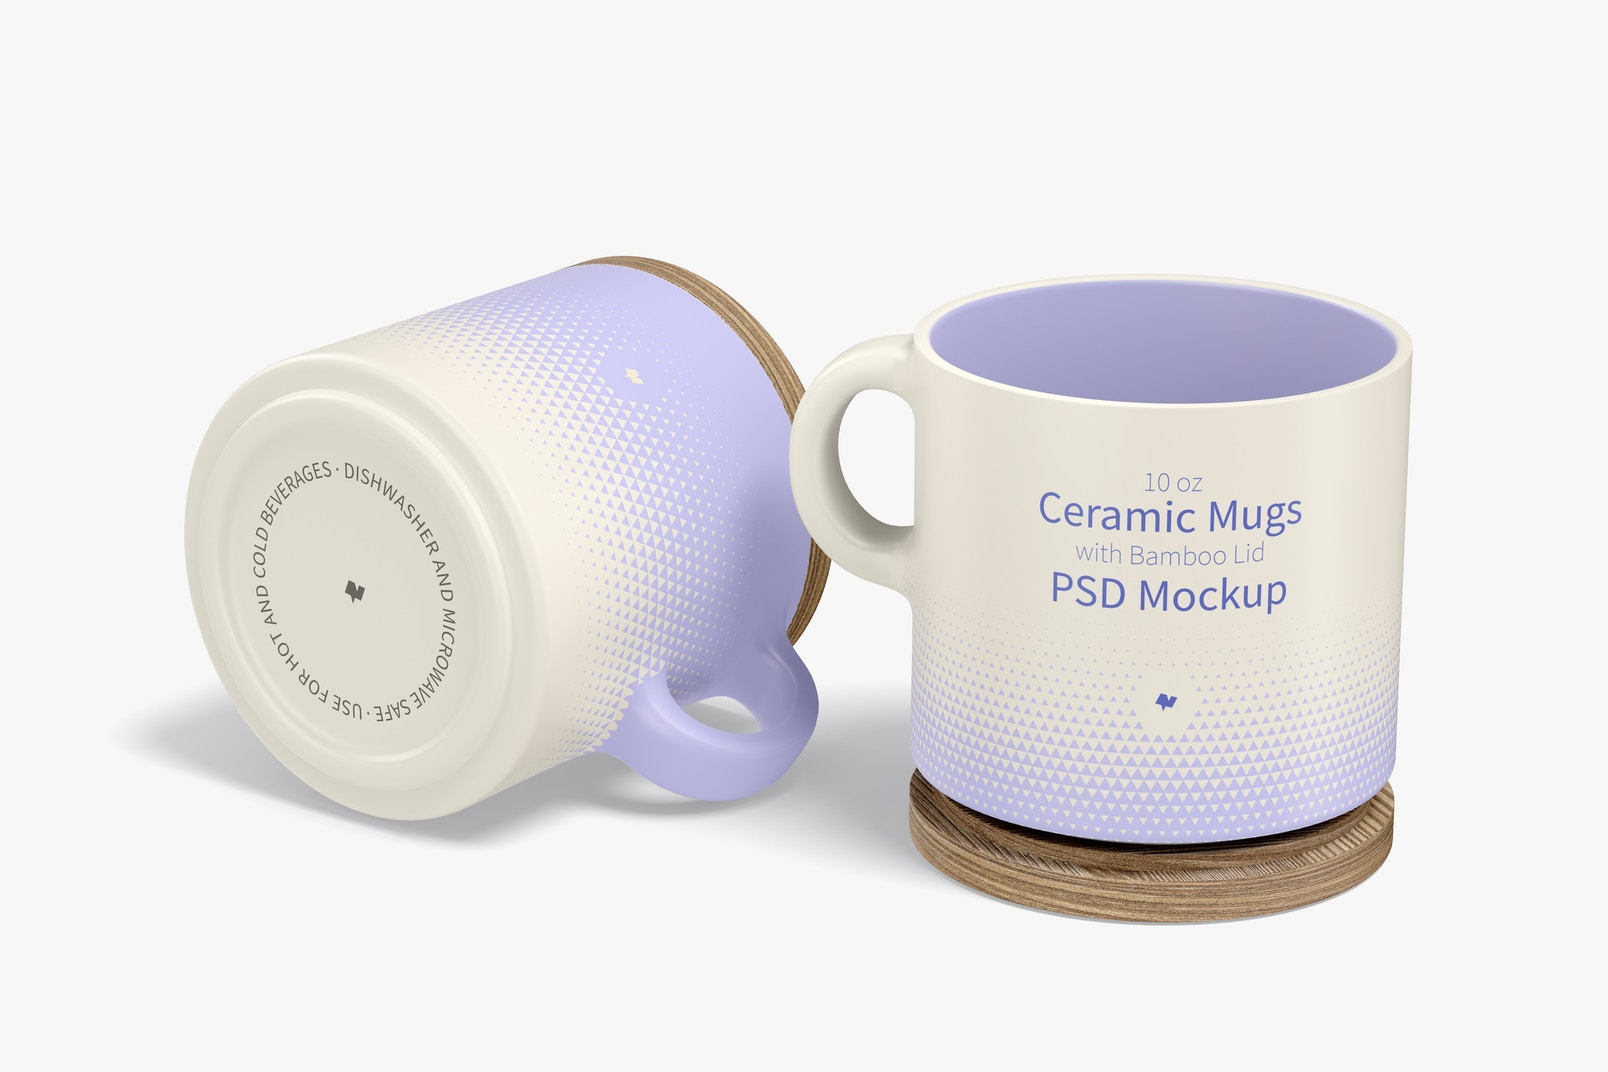 10 oz Ceramic Mugs with Bamboo Lid Mockup